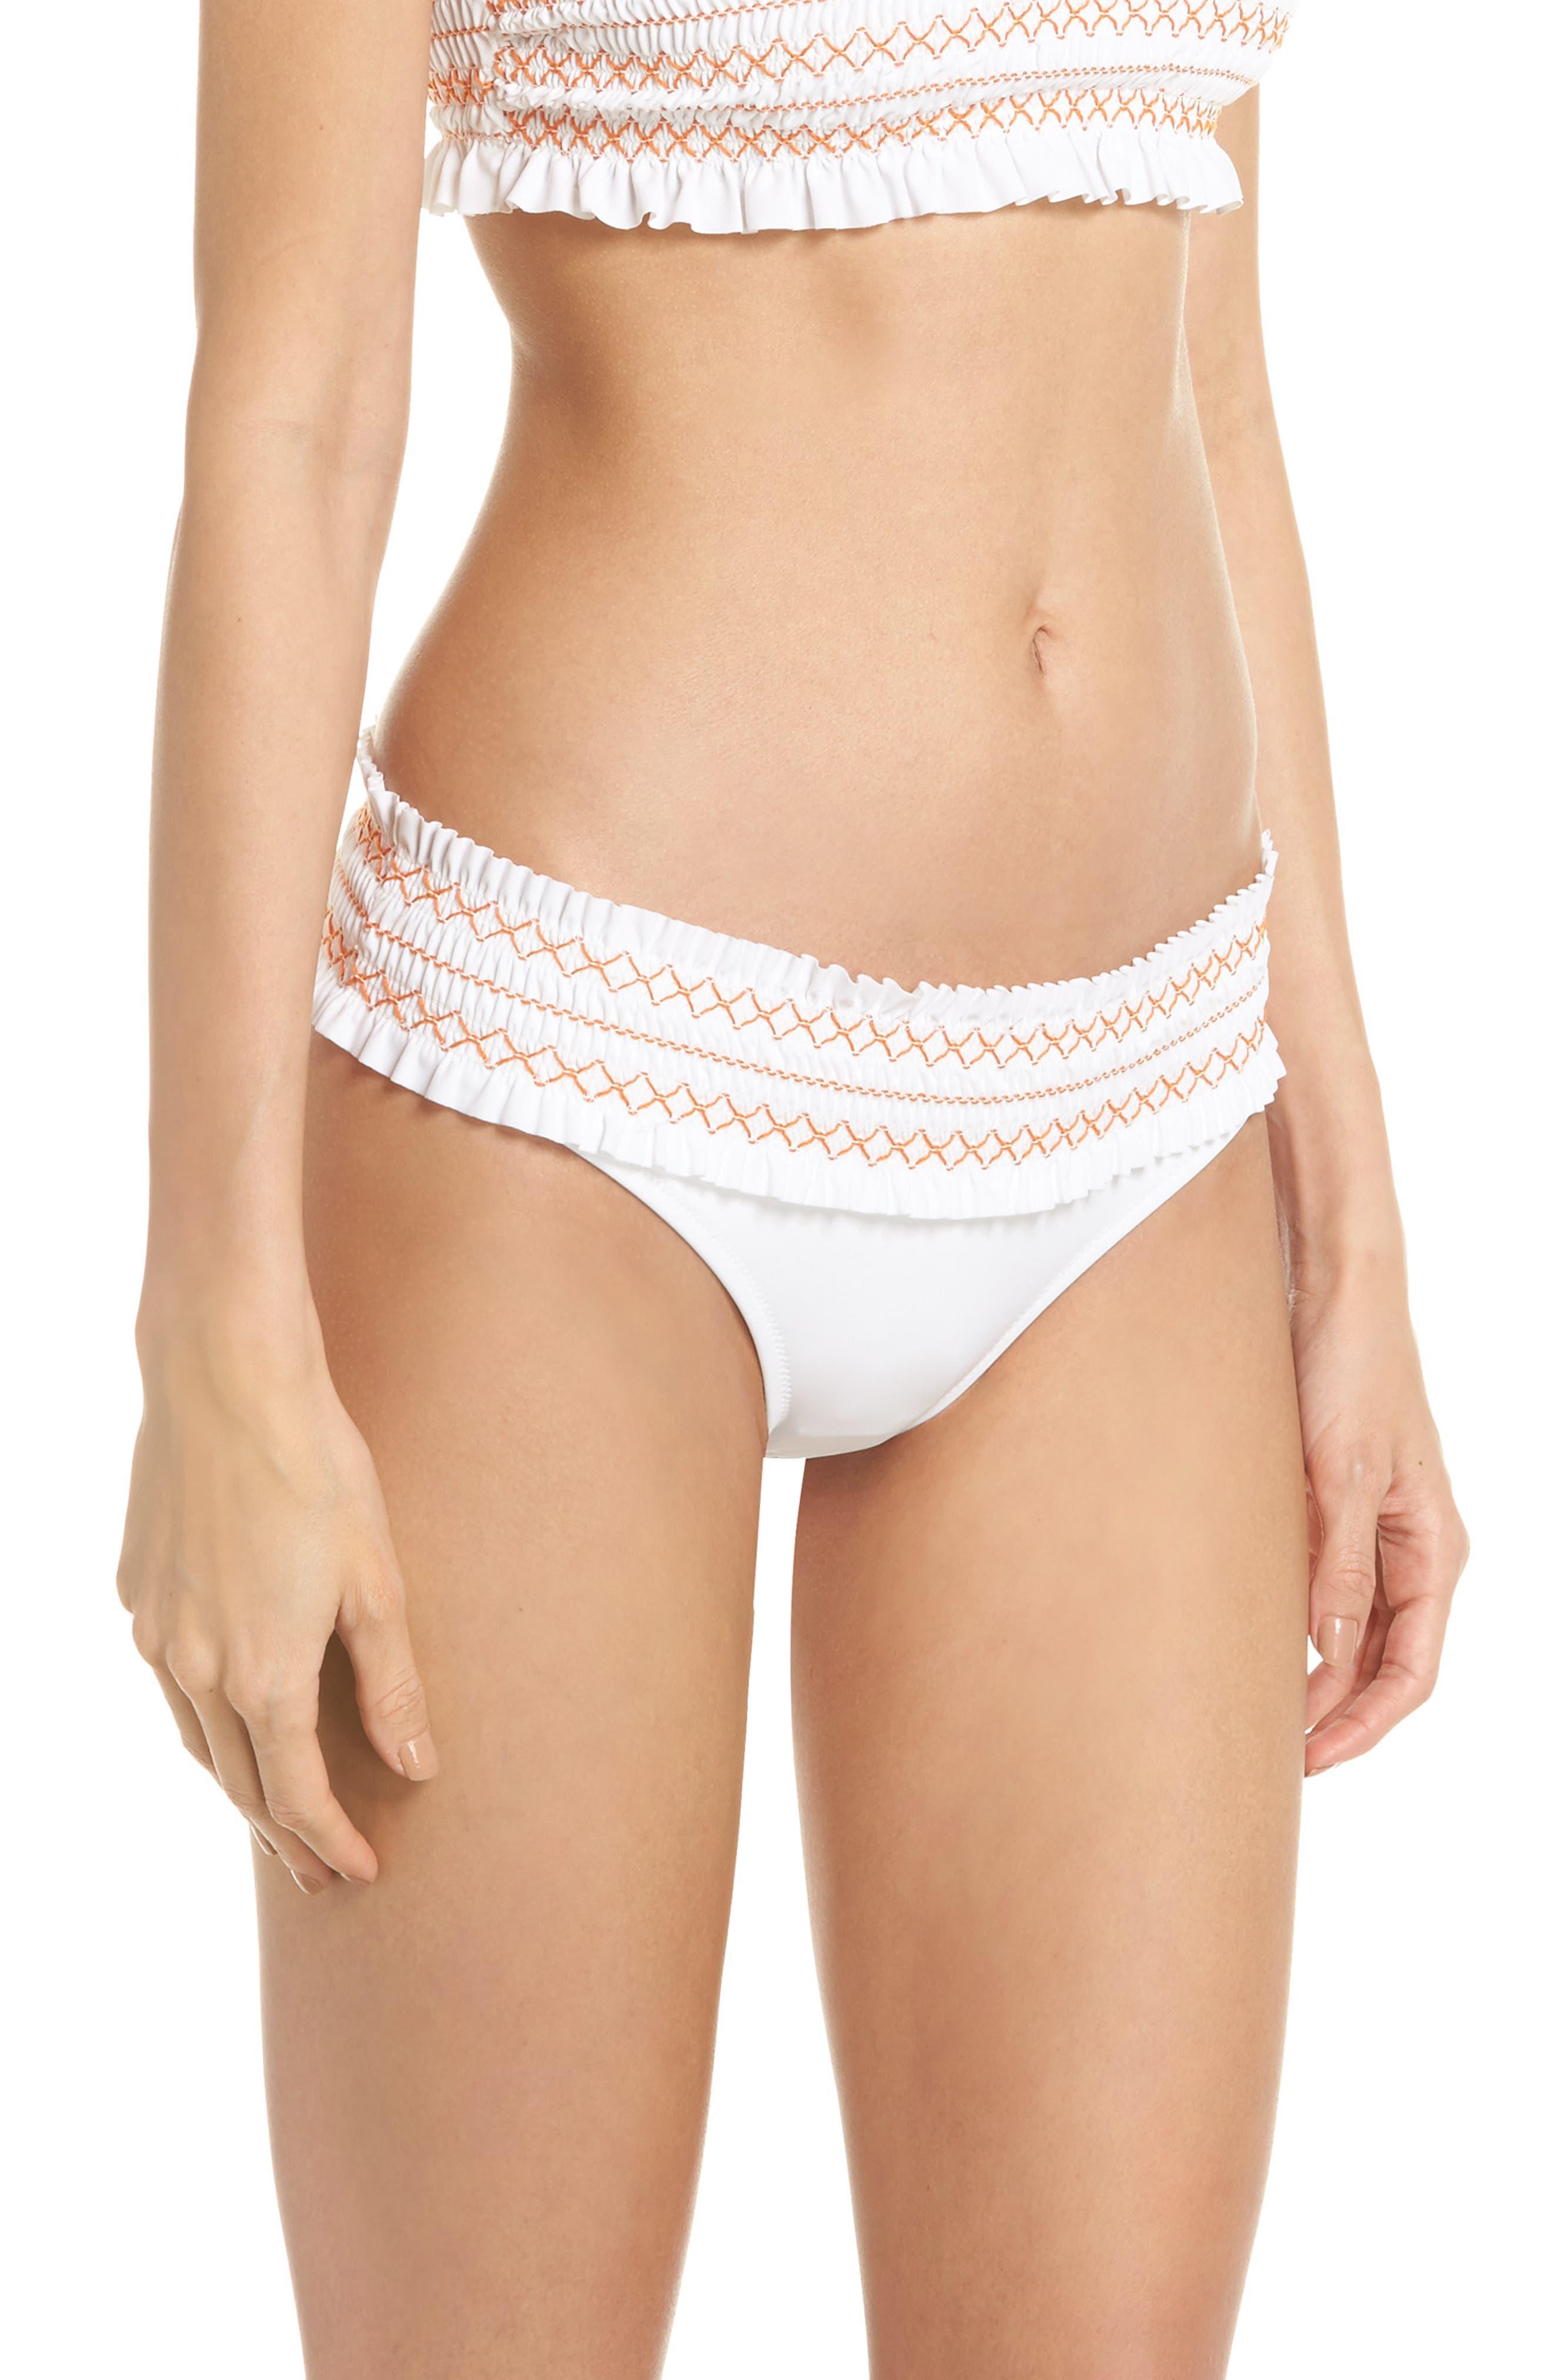 Alternate Image 3  - Tory Burch Costa Smocked Hipster Bikini Bottoms